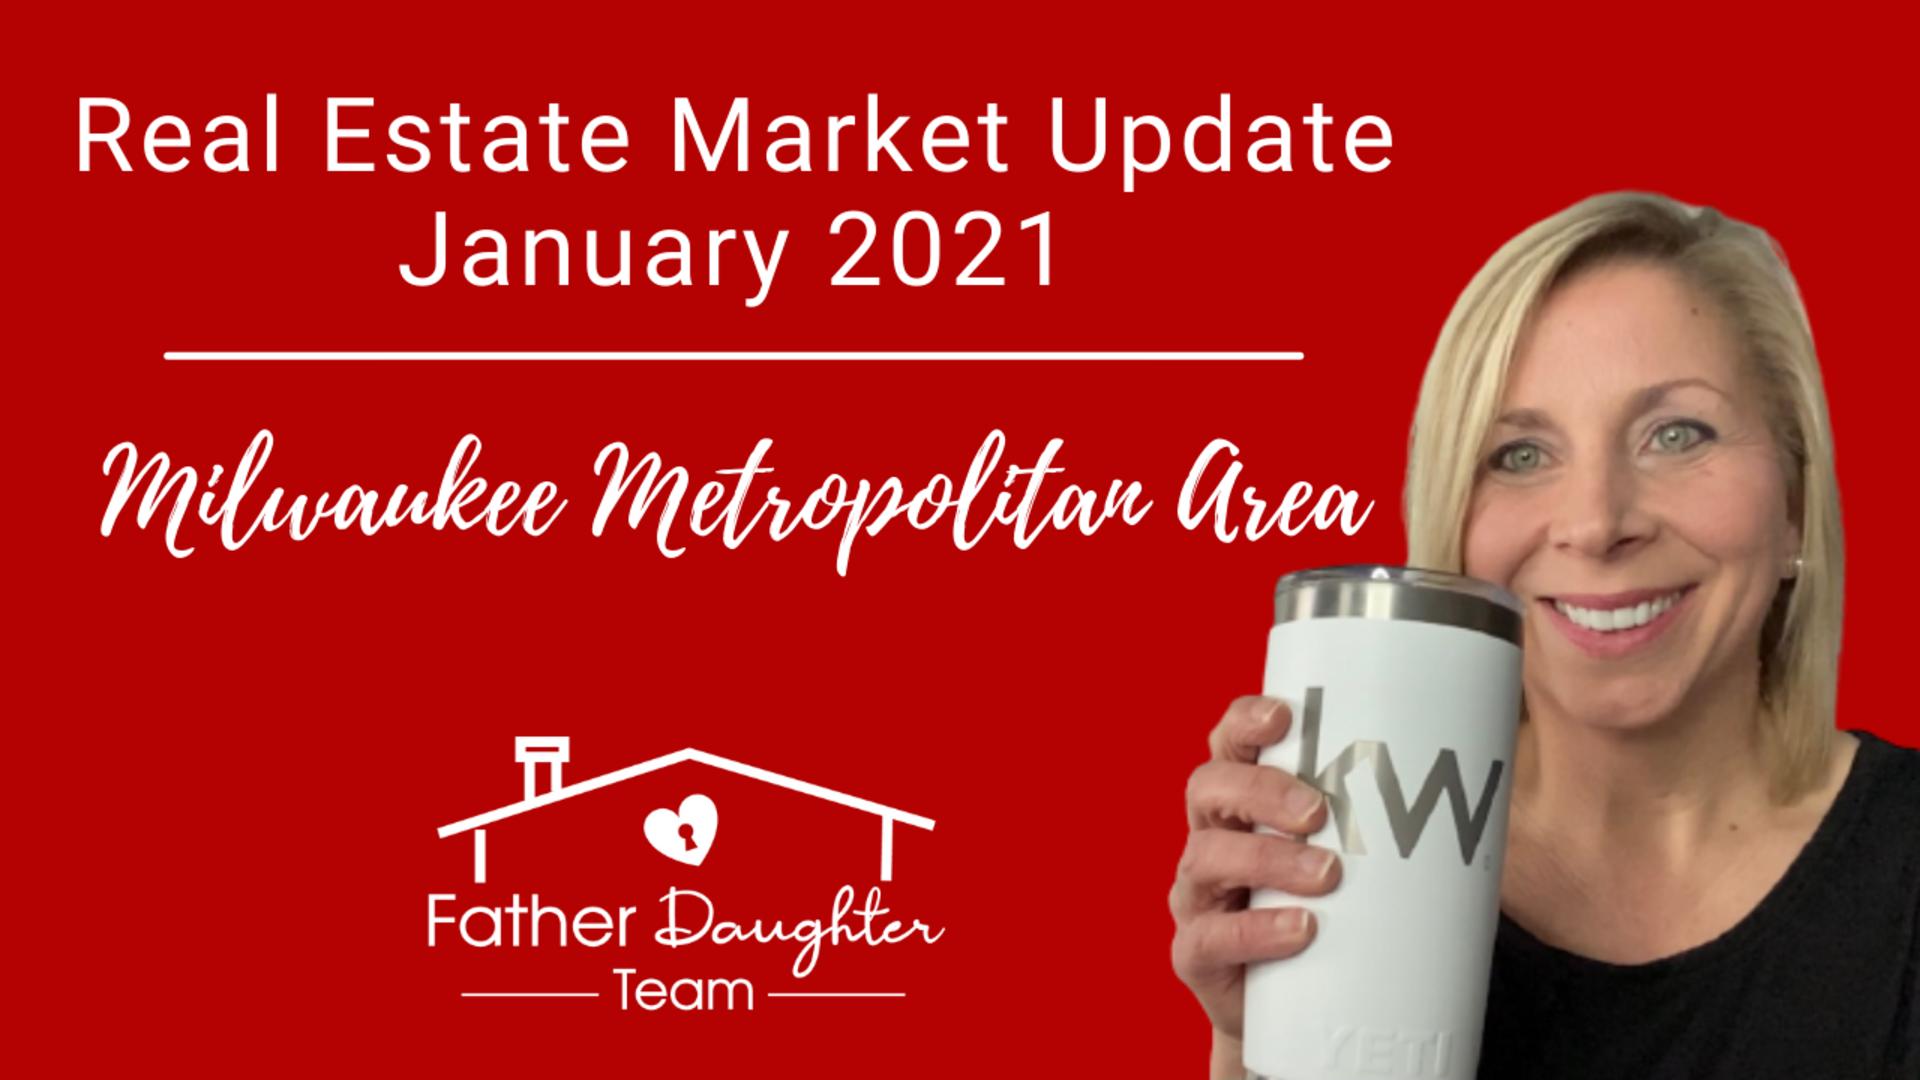 Real Estate Market Update January 2021 | Milwaukee Metropolitan Area